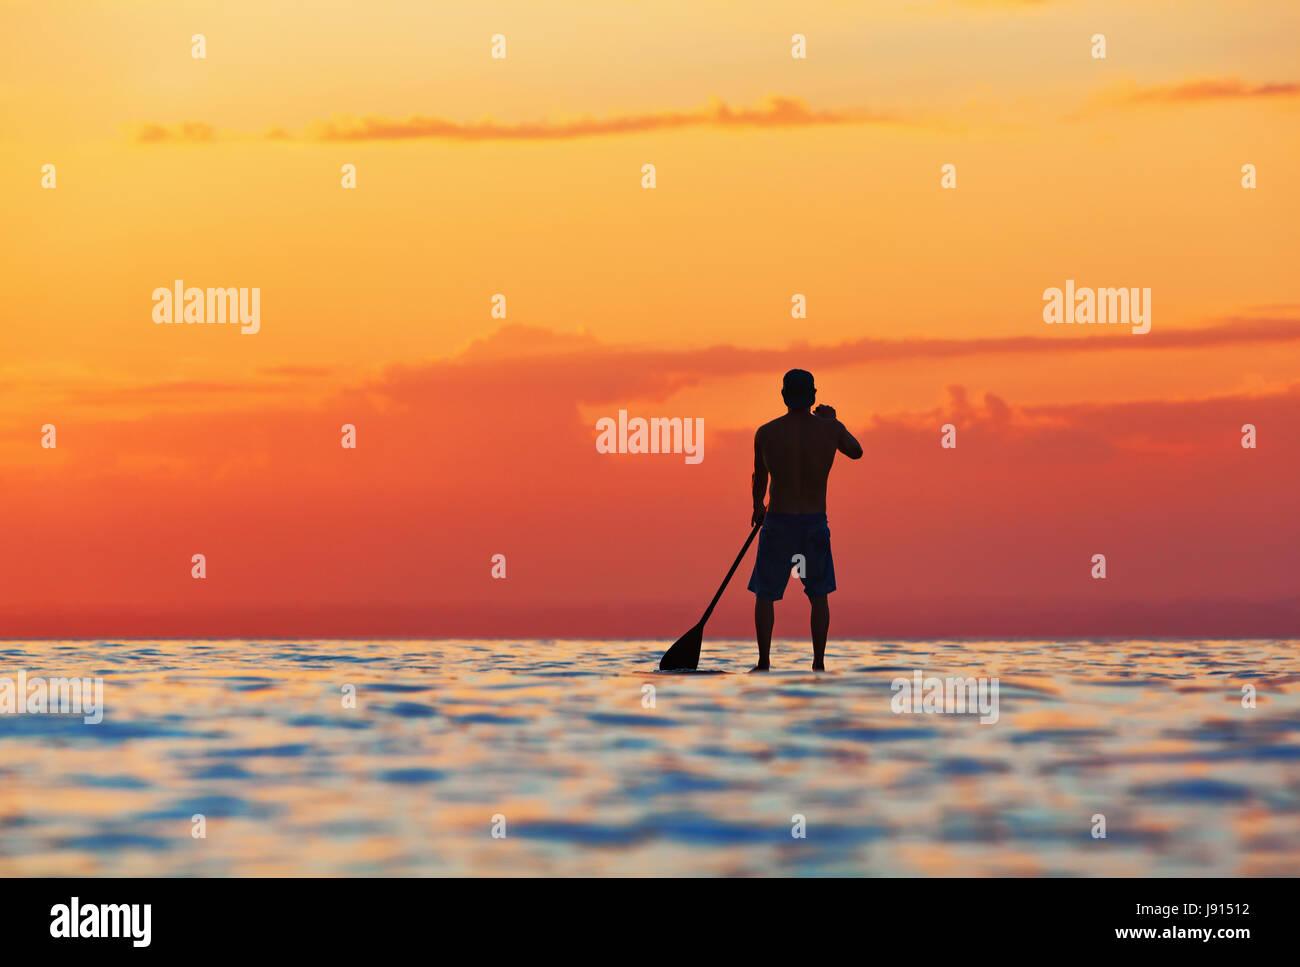 Paddel-Boarder. Schwarze Sonnenuntergang Silhouette der jungen Sportler Paddeln auf Stand up Paddleboard. Gesunde Stockbild